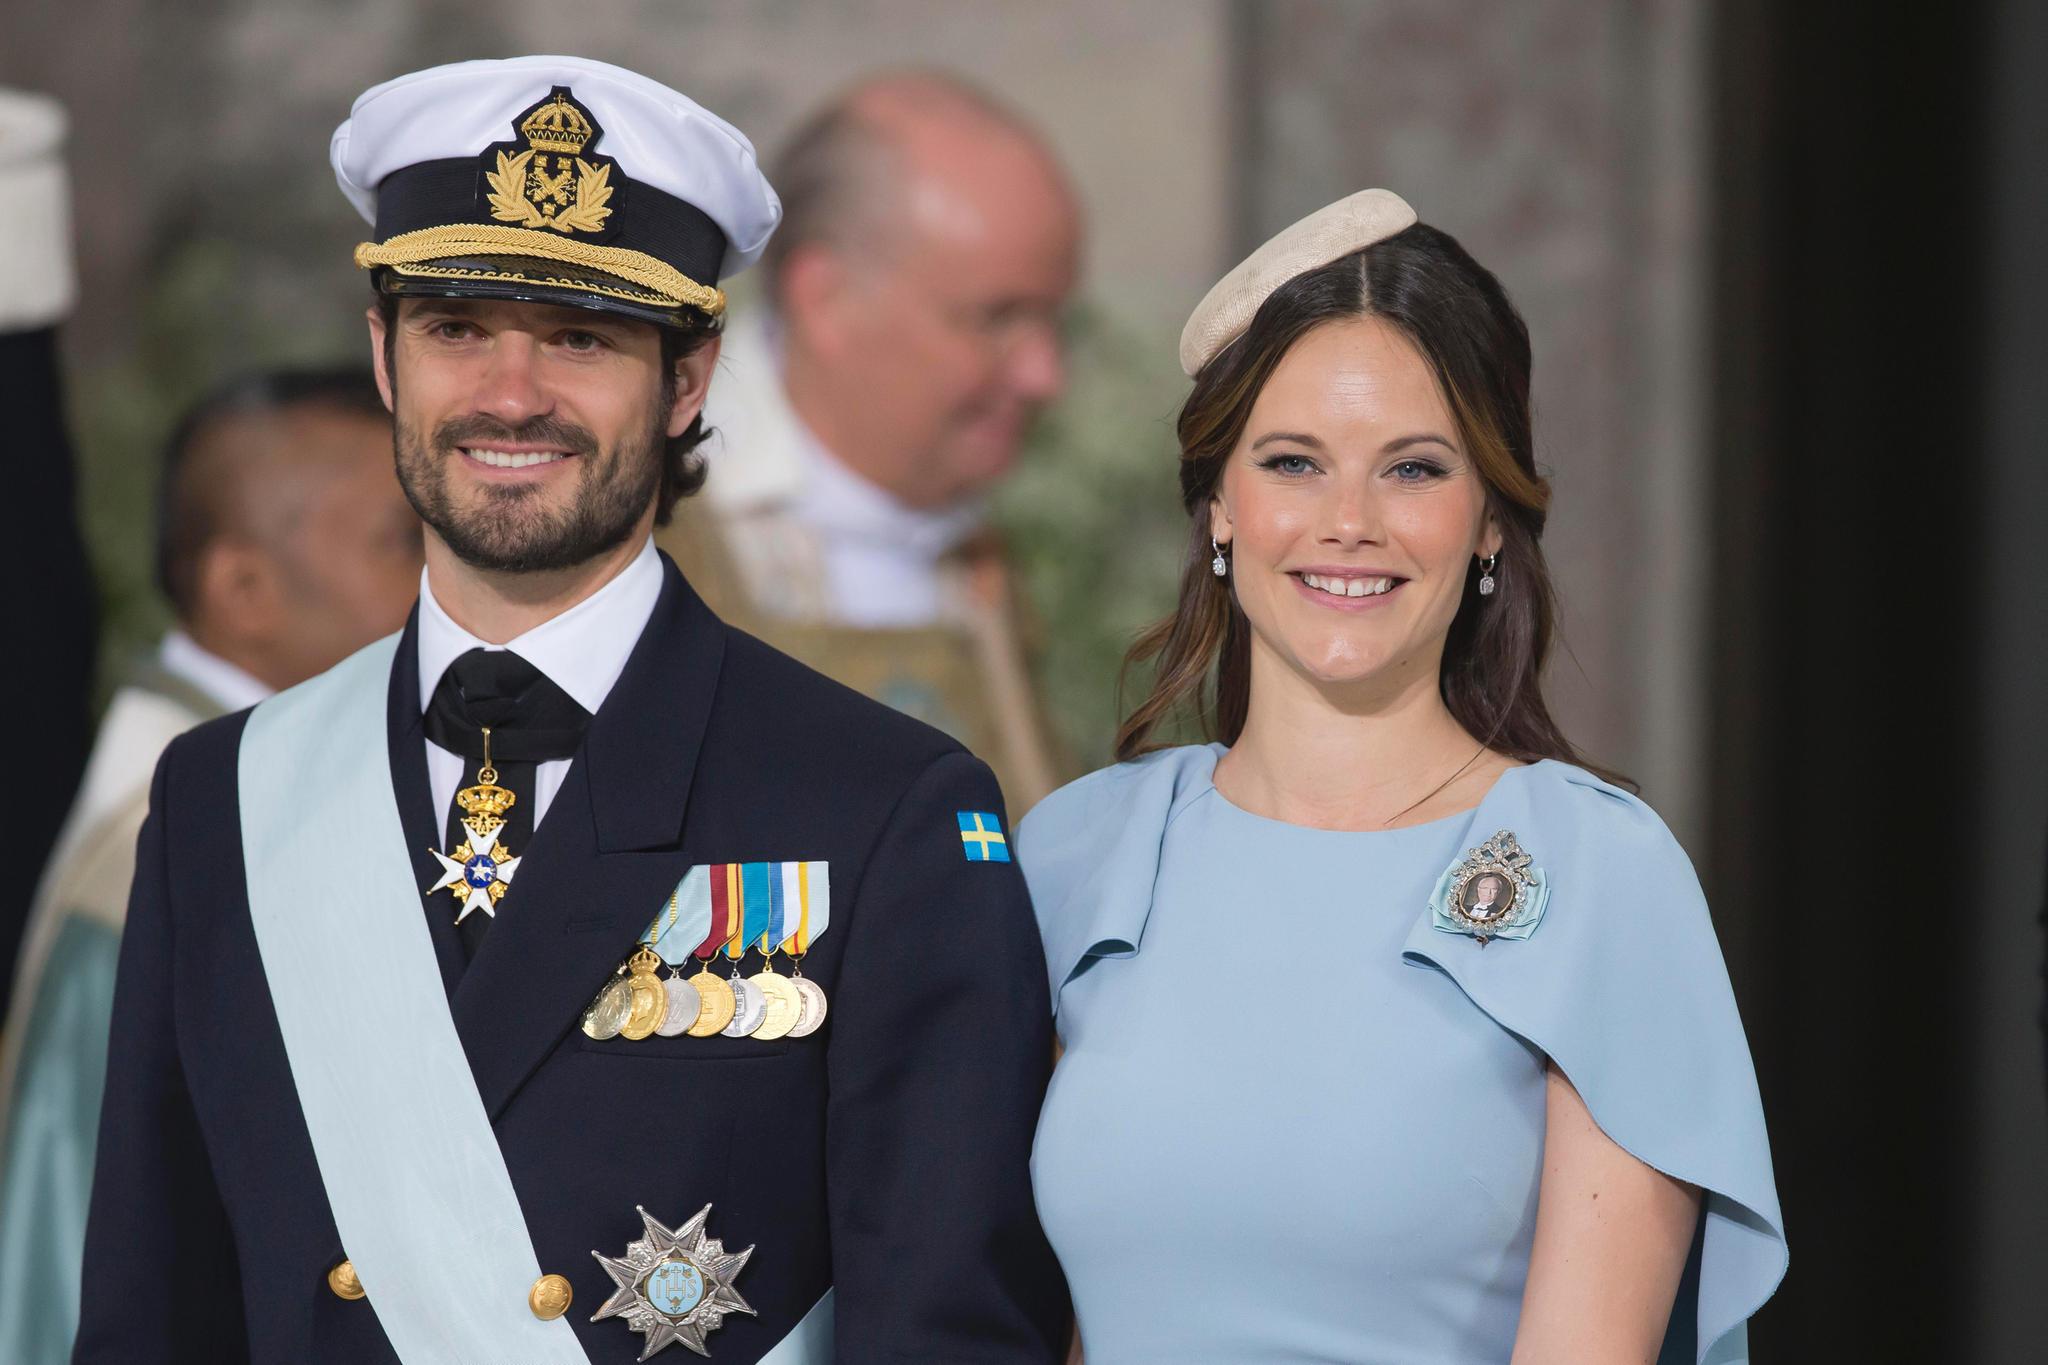 Prinz Carl Philip Prinzessin Sofia Mit dem zweiten Kind